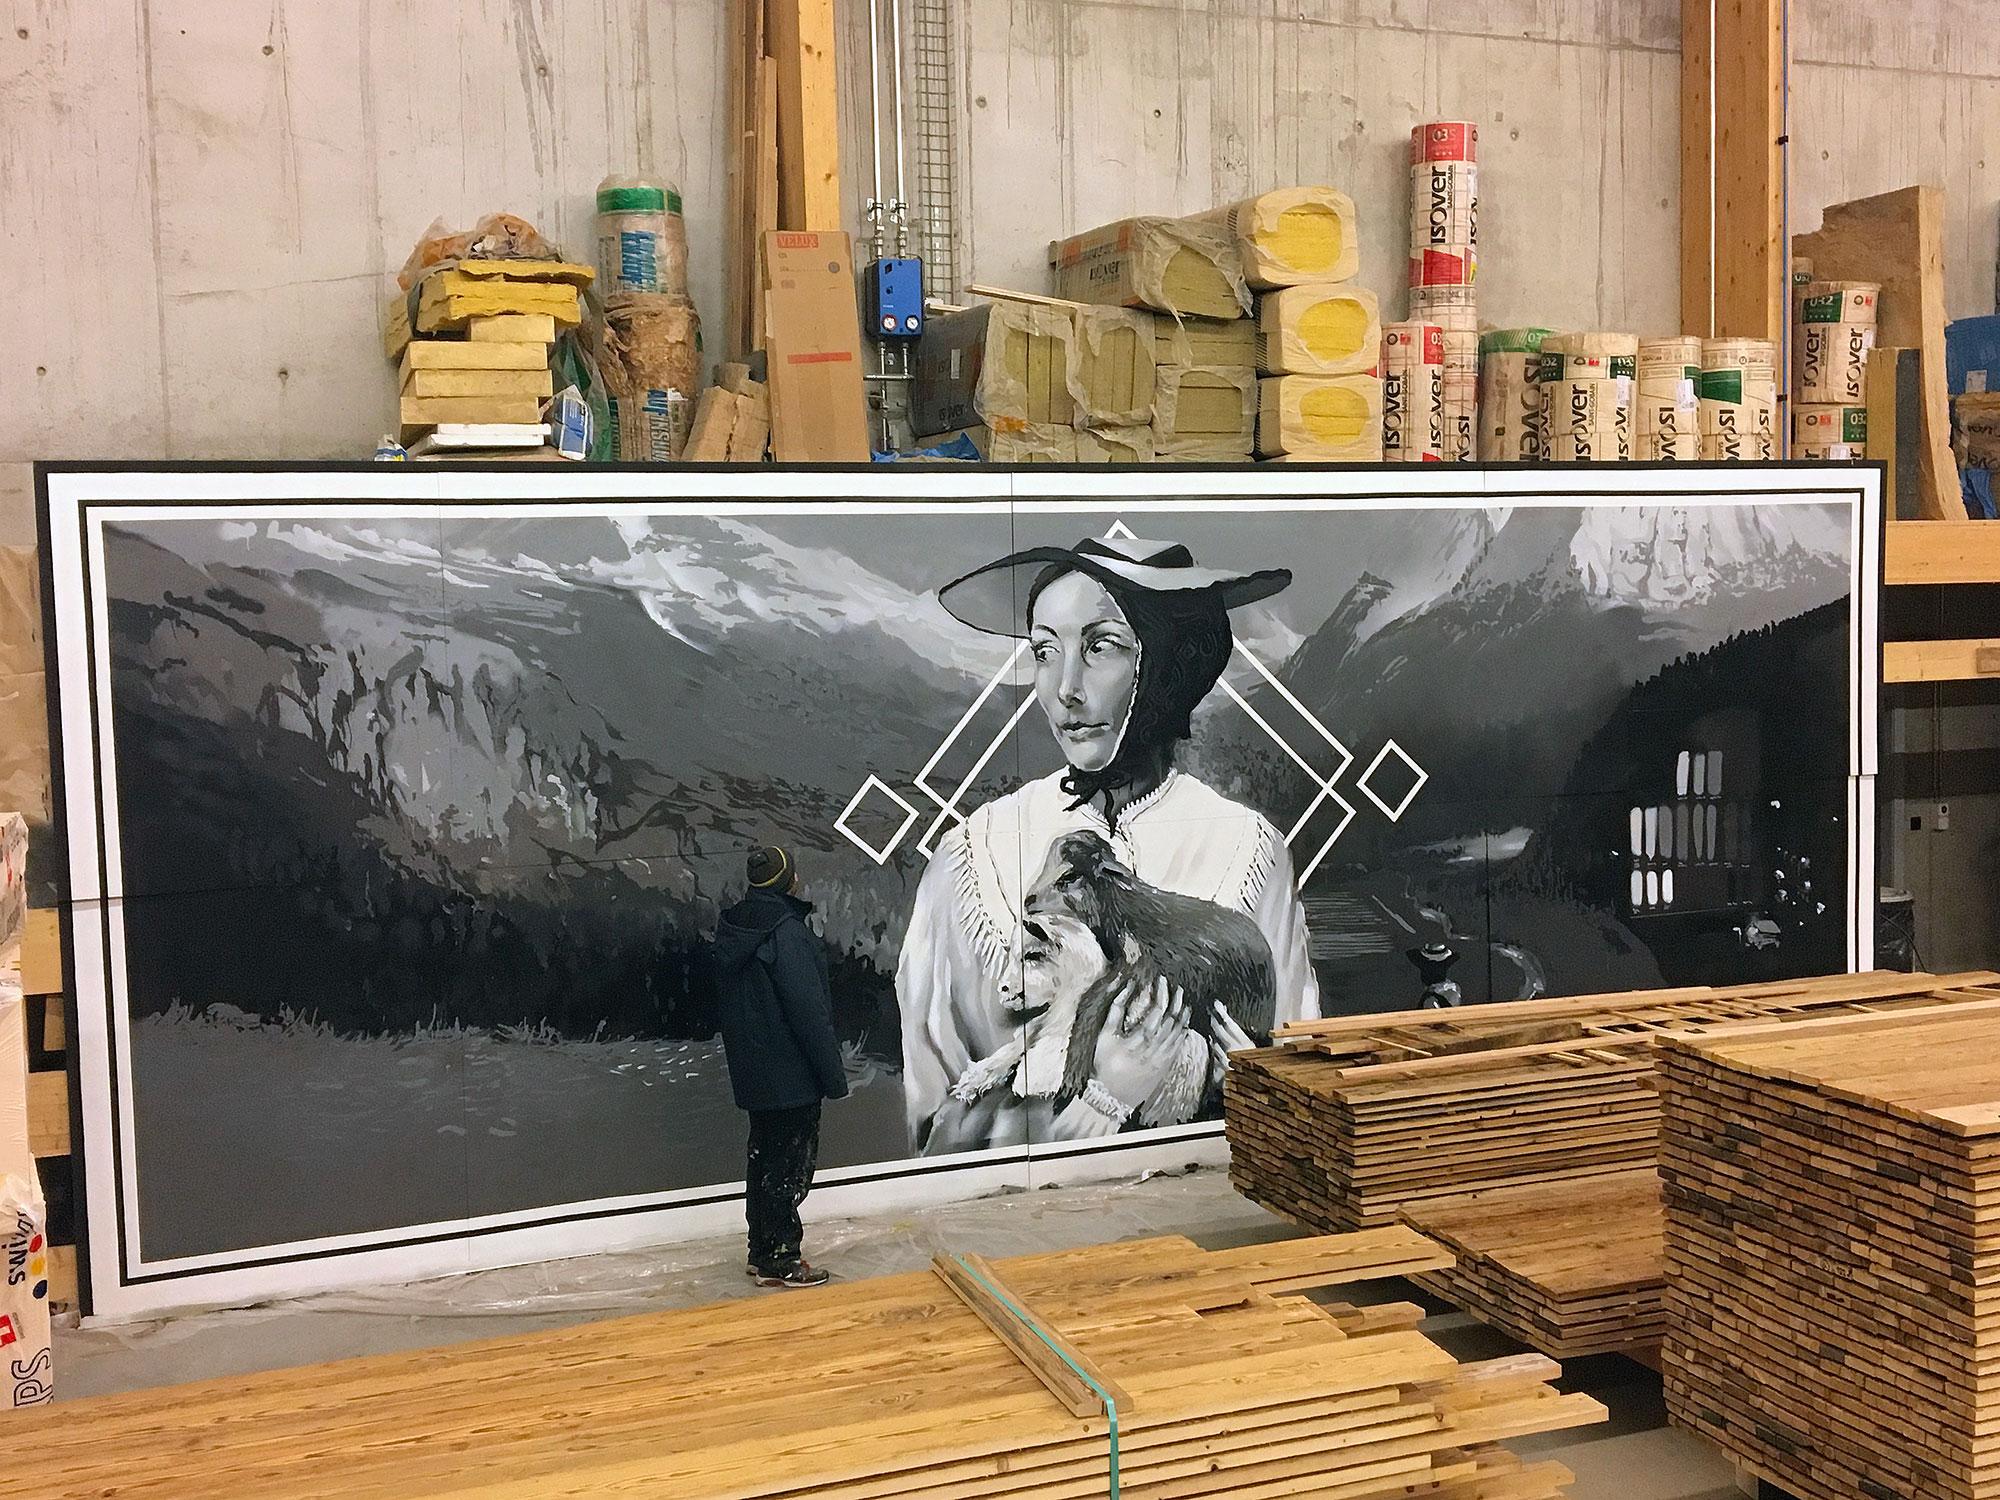 rosalp luxe verbier valais suisse jasm1 jasm one noir et blanc valaisanne chèvre paysage vallée detail graffiti street art urban peinture big wall façade